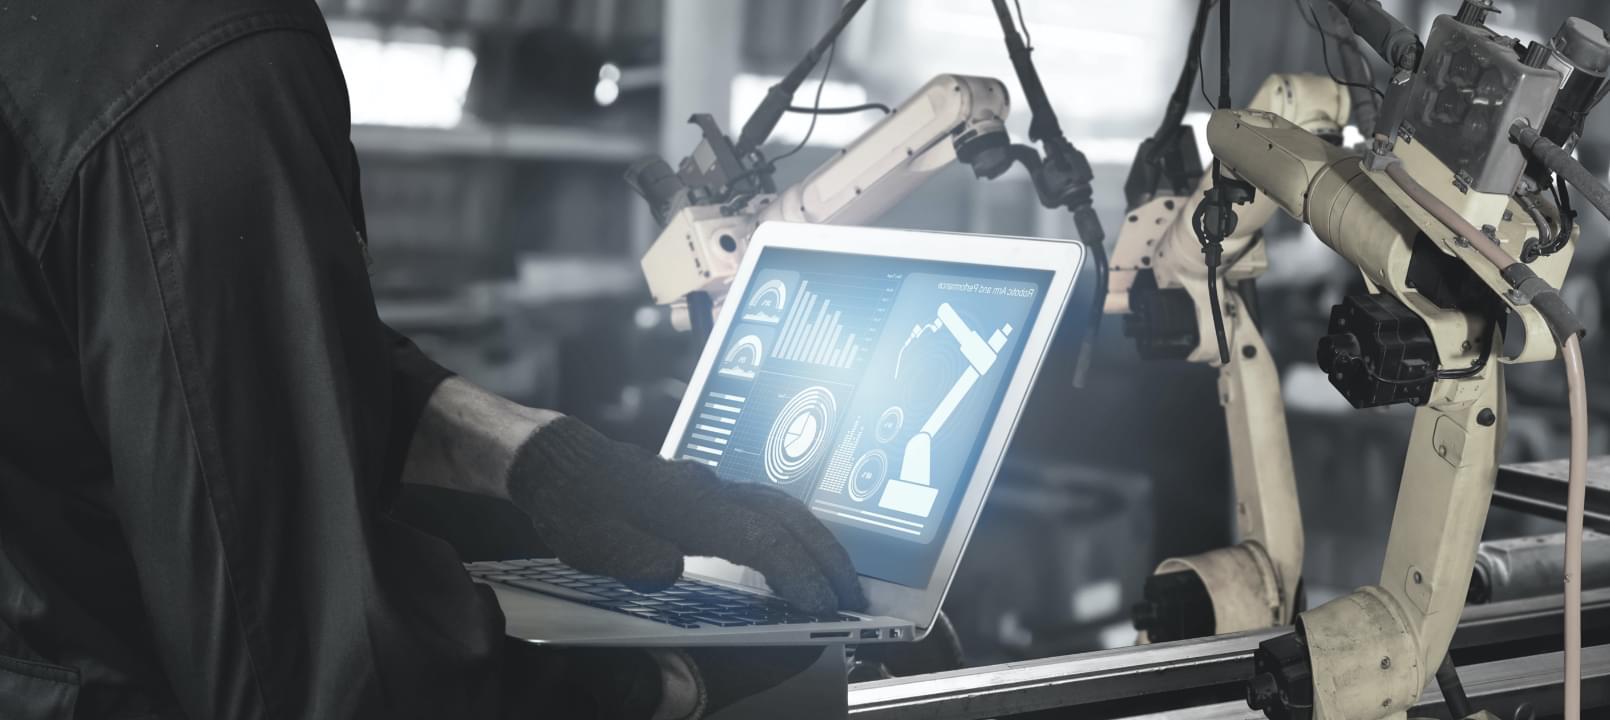 Controls Access to OT Systems with Micro-Segmentation